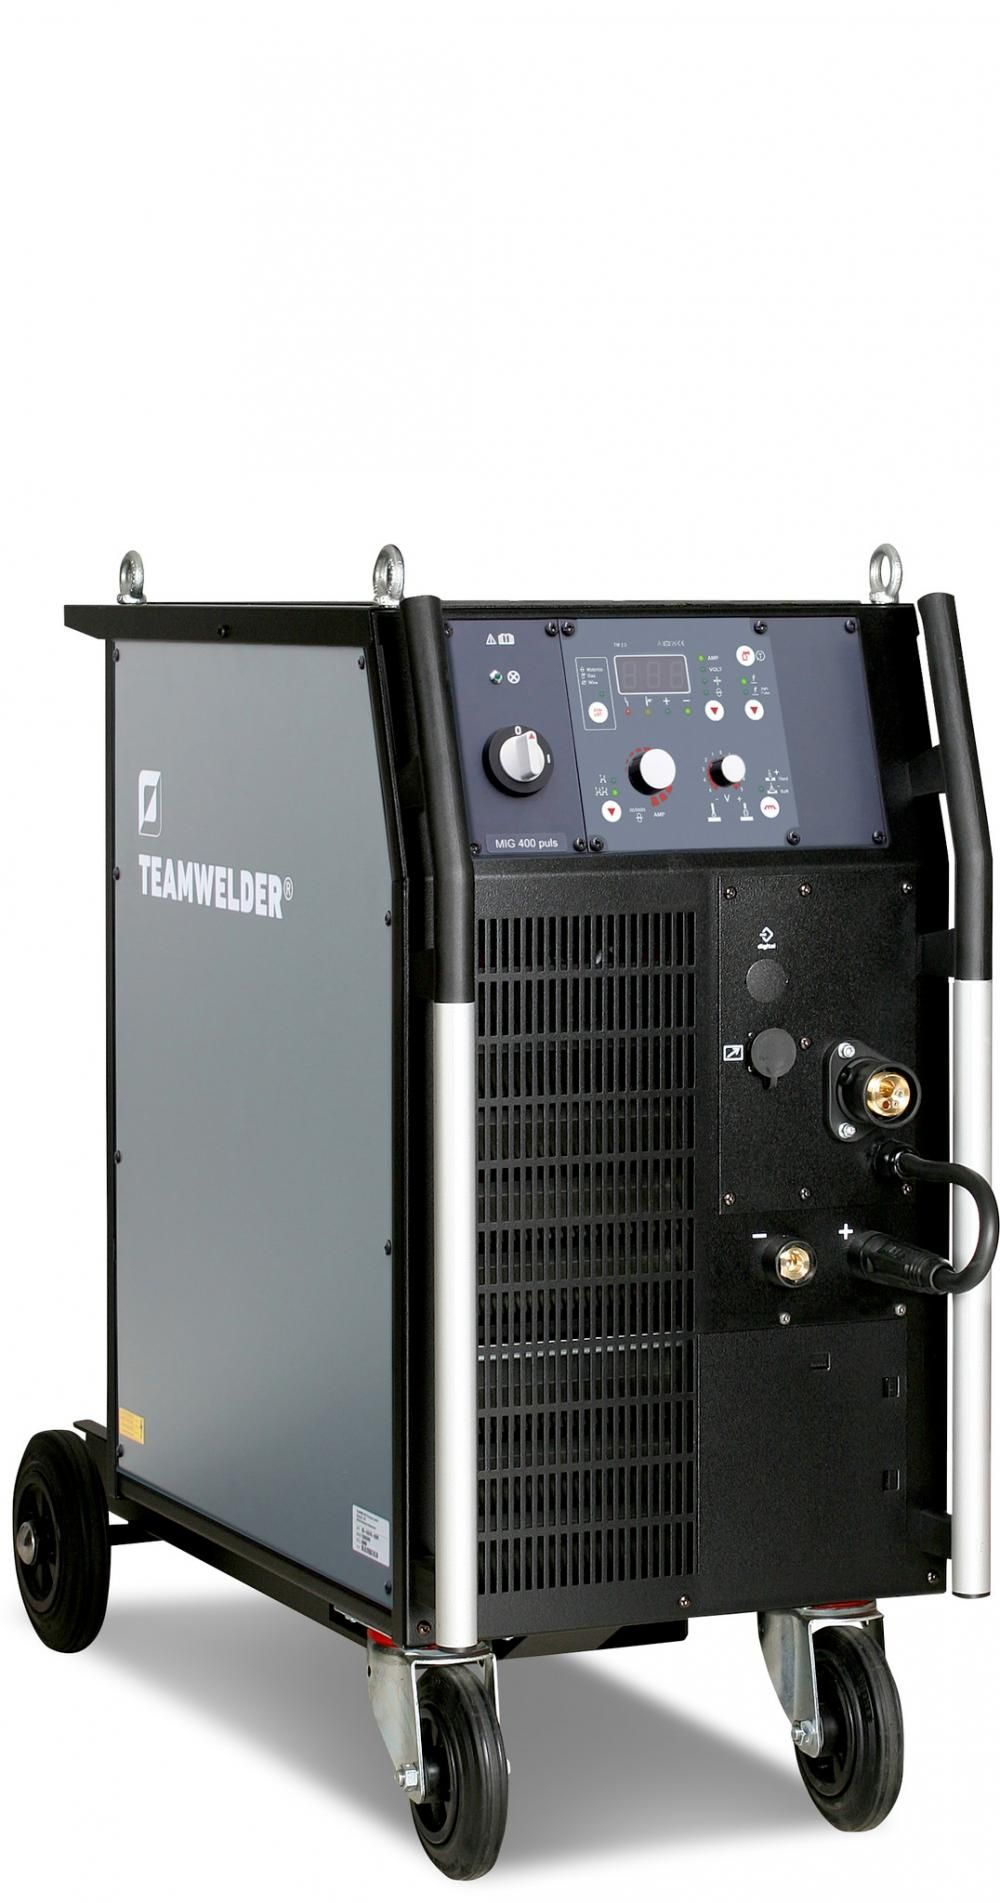 Teamwelder MIG 400 Synergic KG Pulse mono